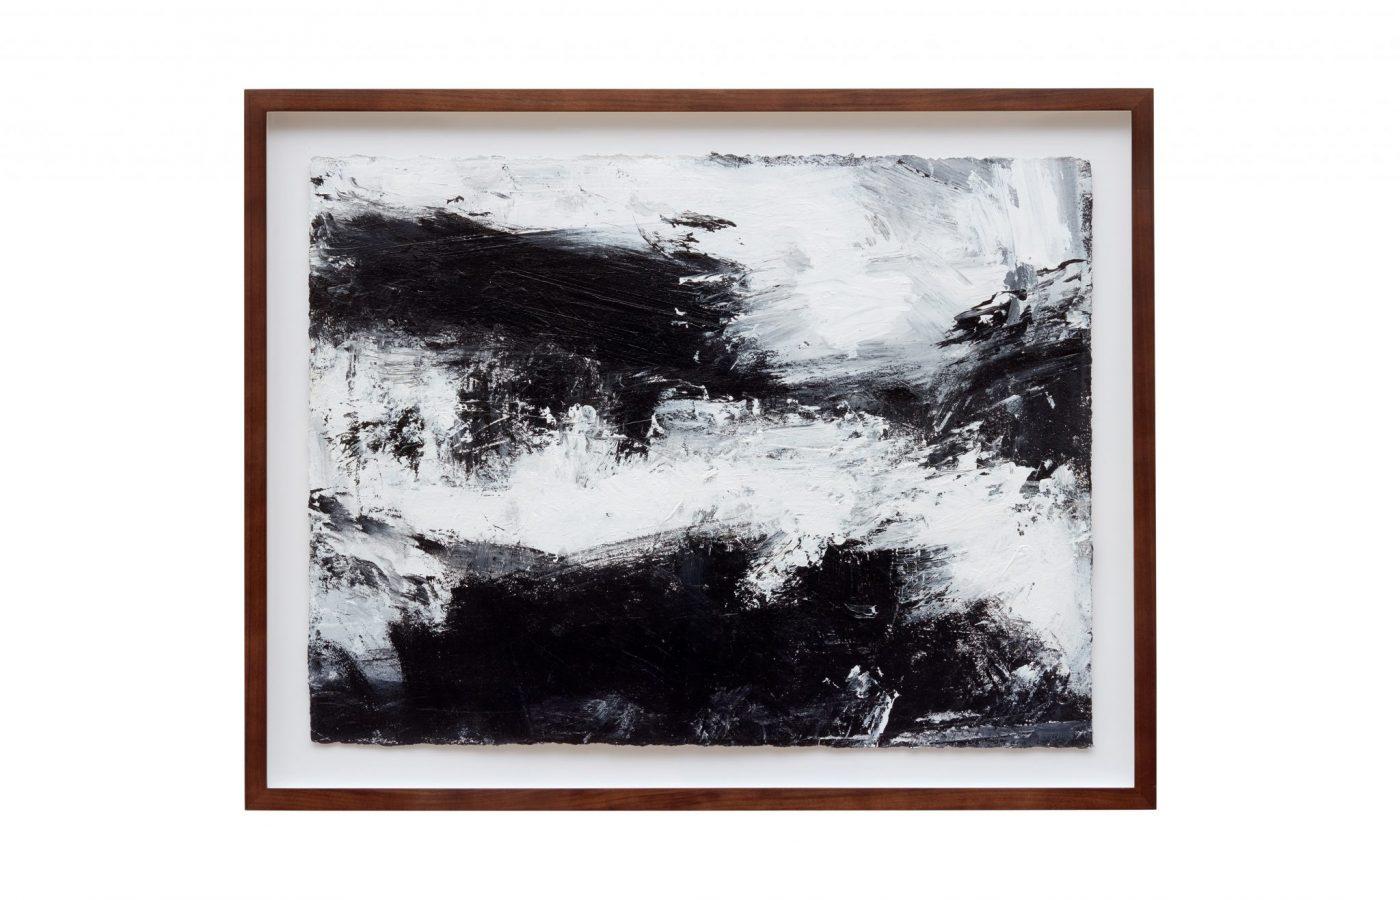 FXF18-15 John Virtue Untitled No 2 2014